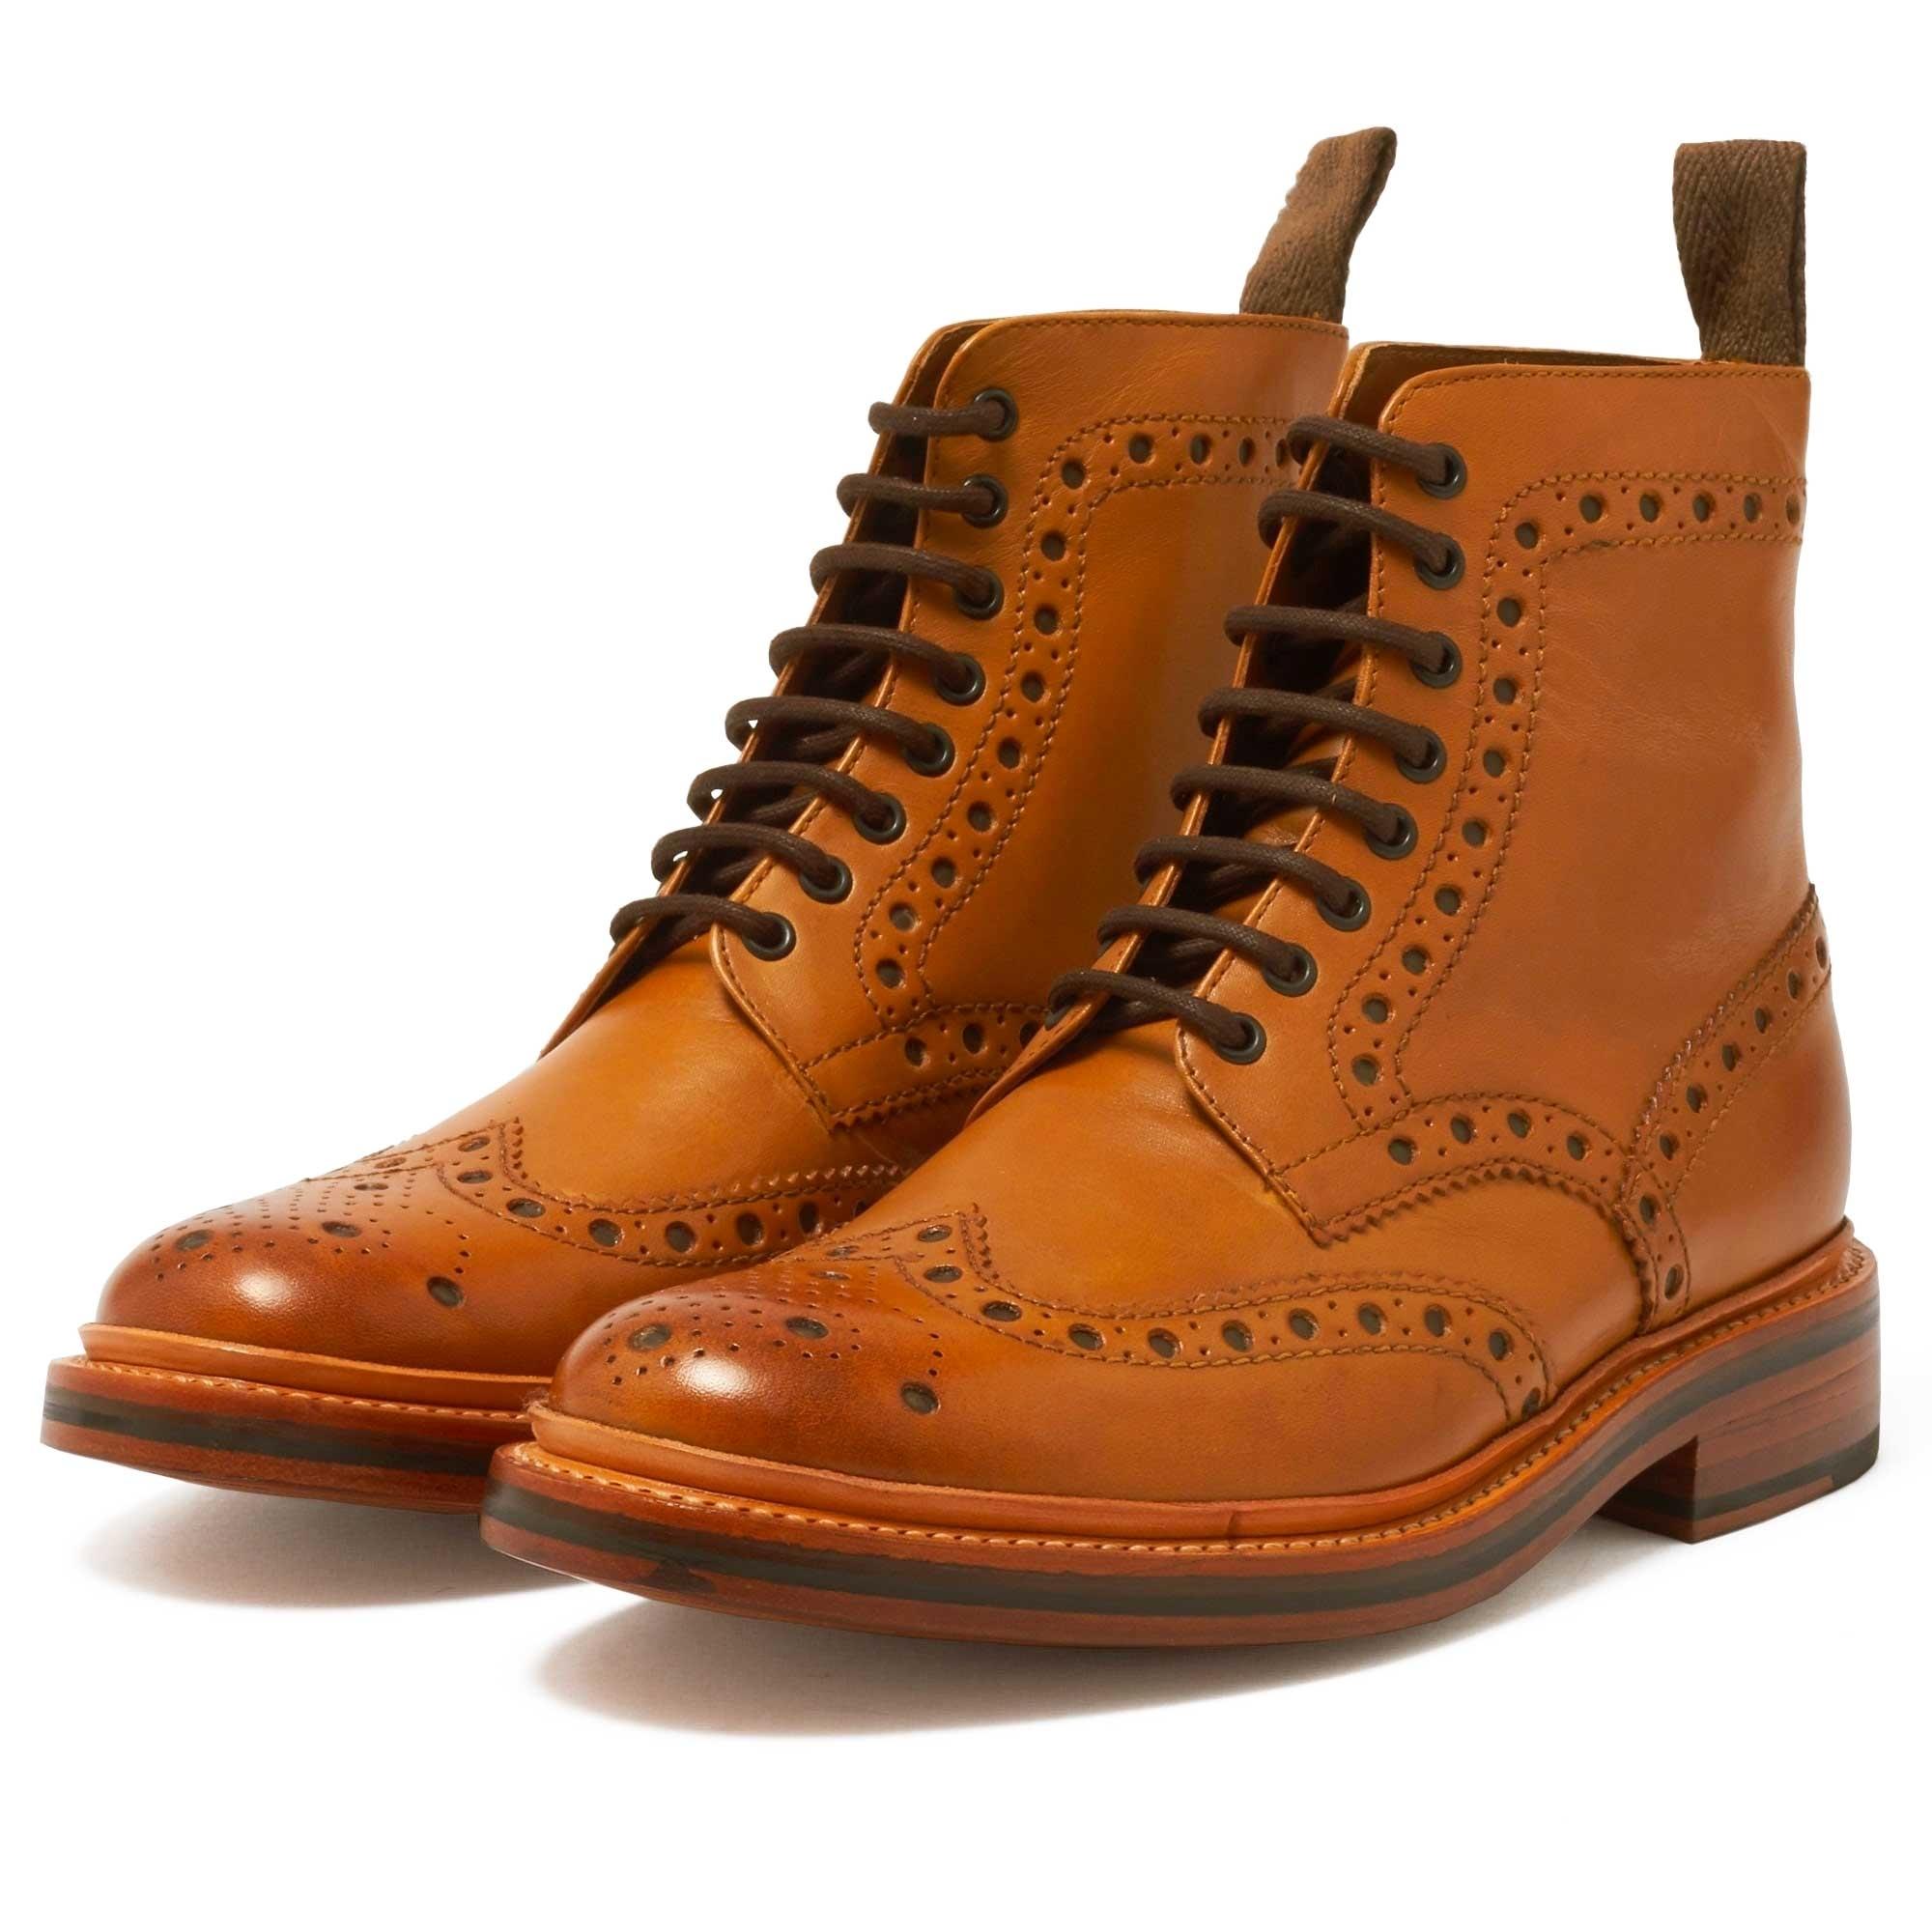 grenson boot sale